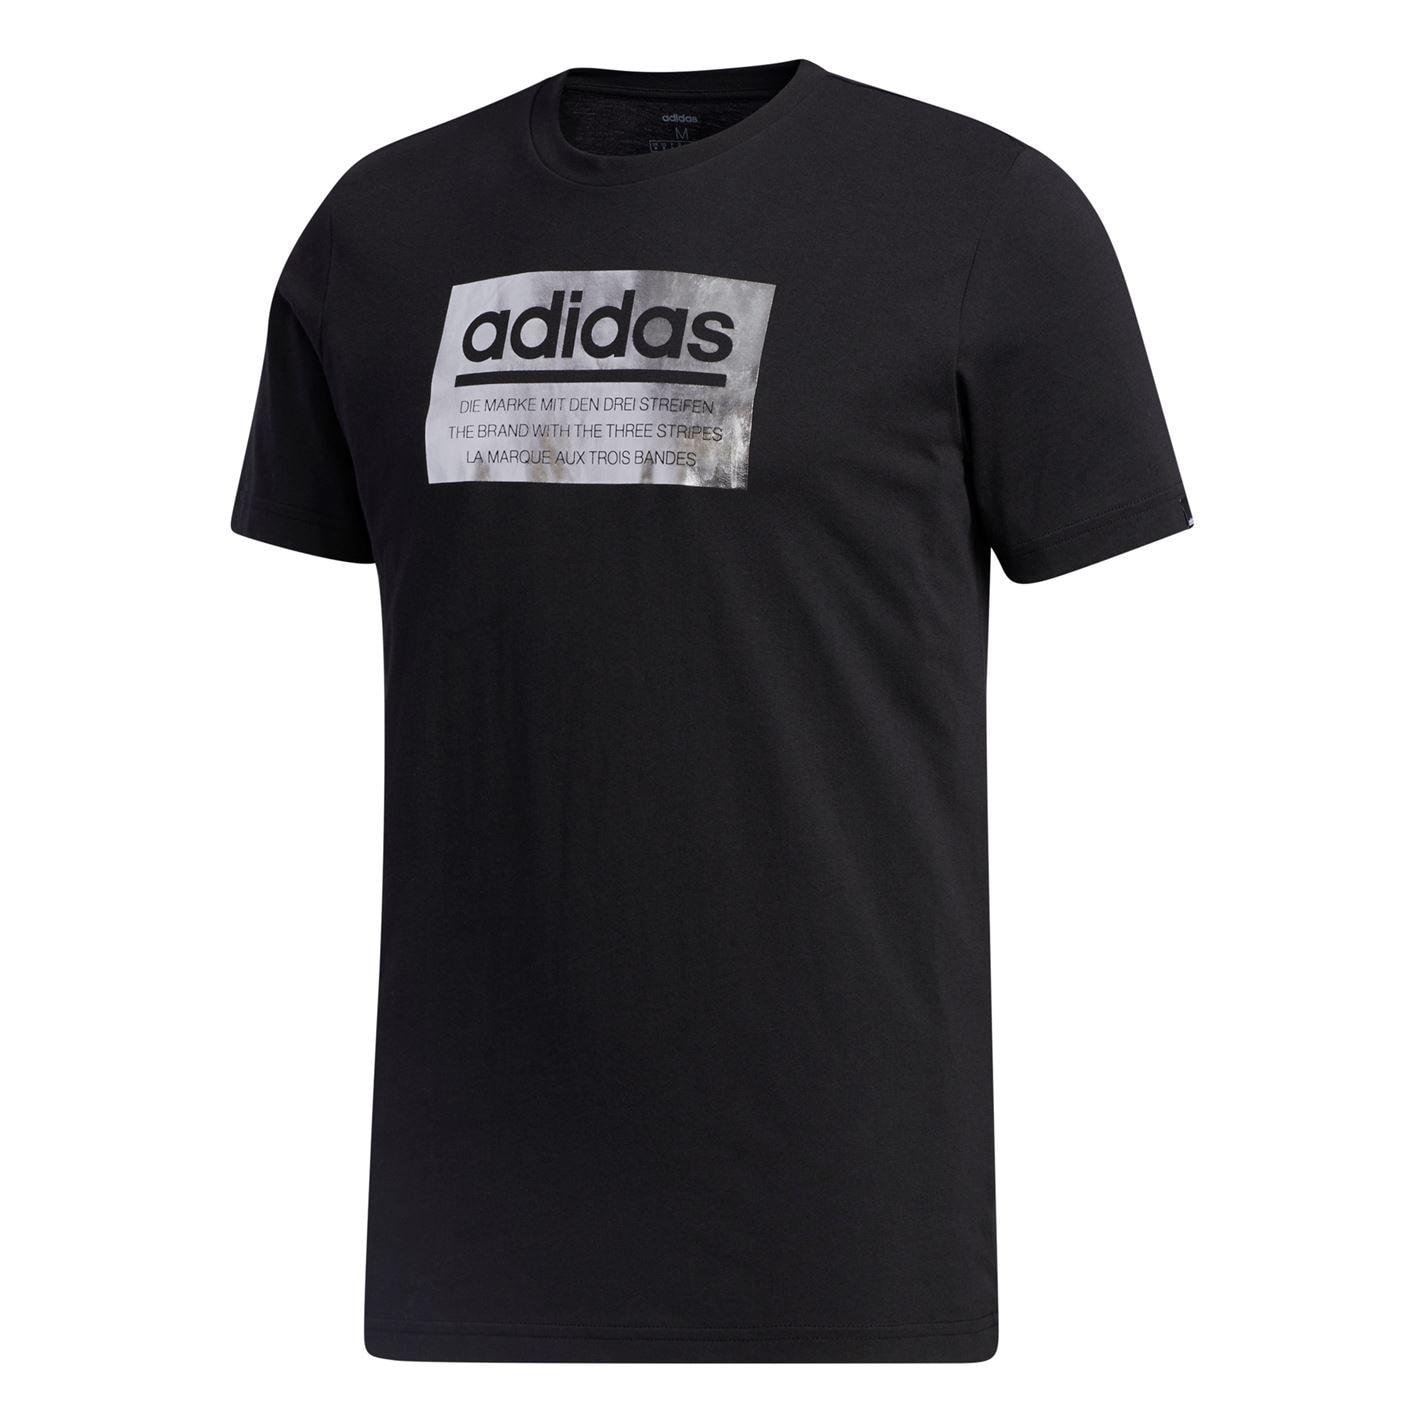 Adidas Mens Graphic Foil Box T-Shirt